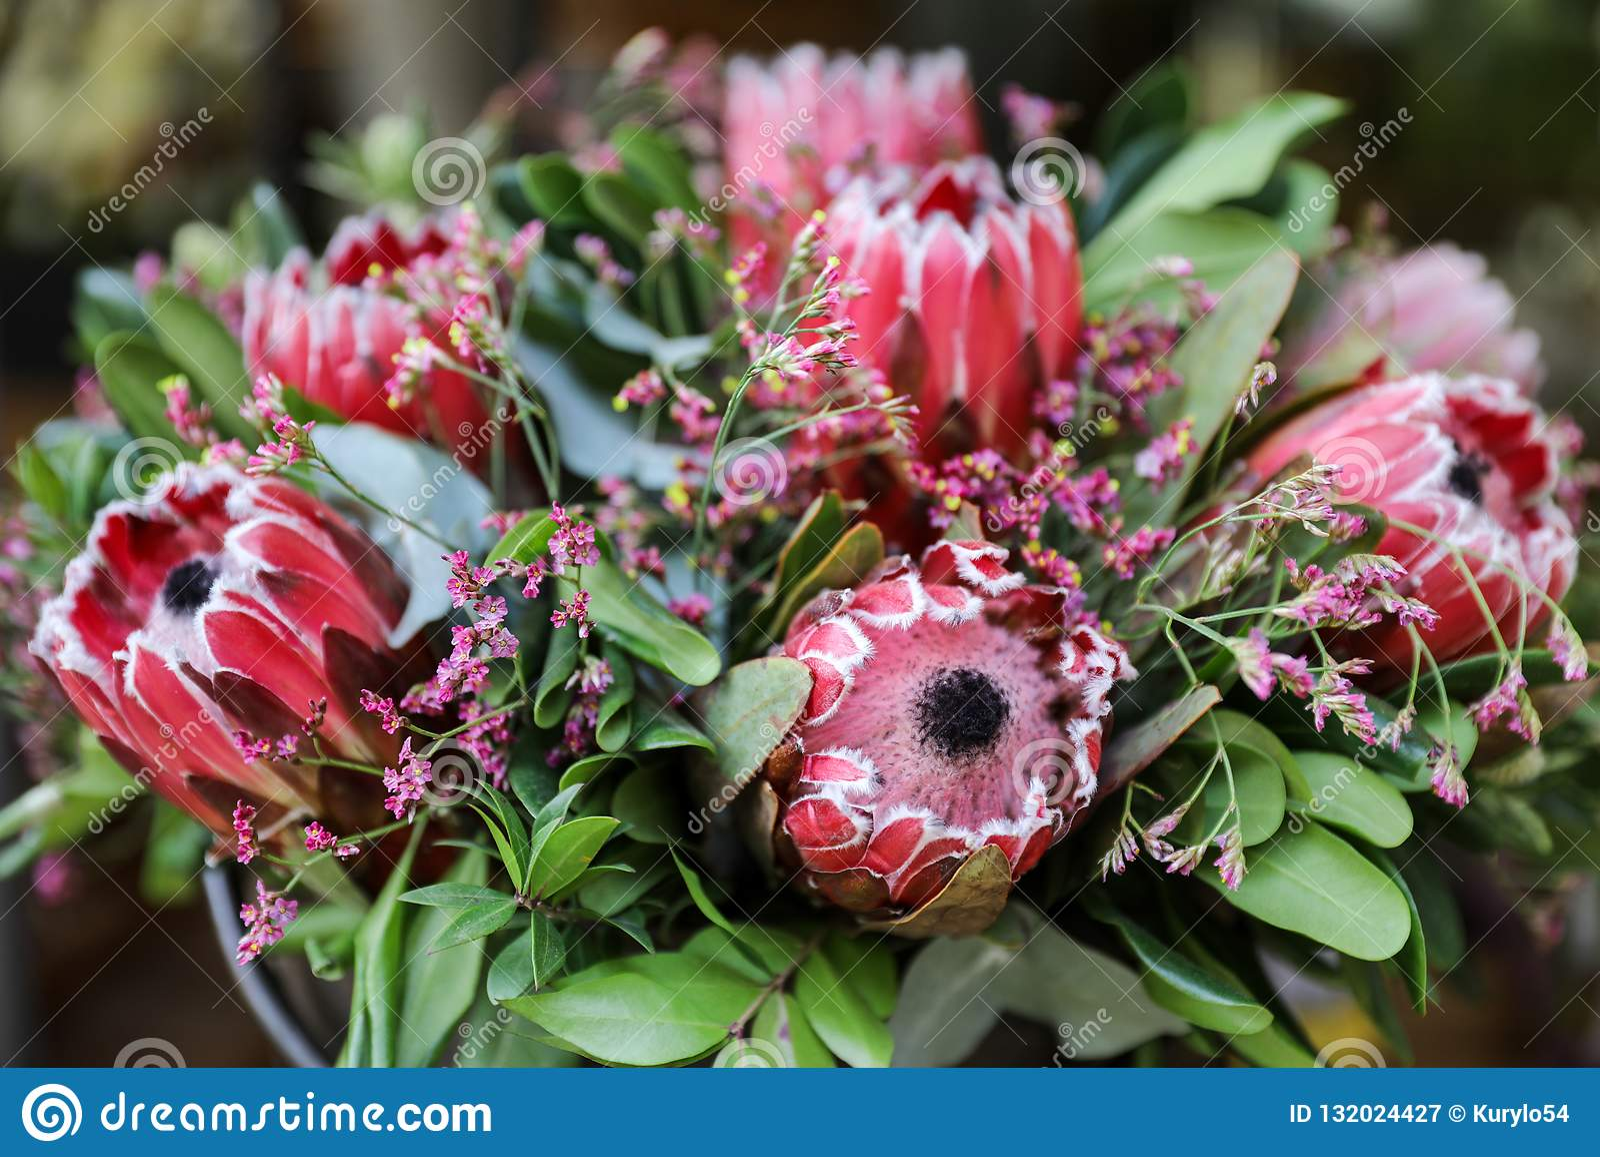 Beautiful fresh flower arrangement of Protea macrocephala flowers.